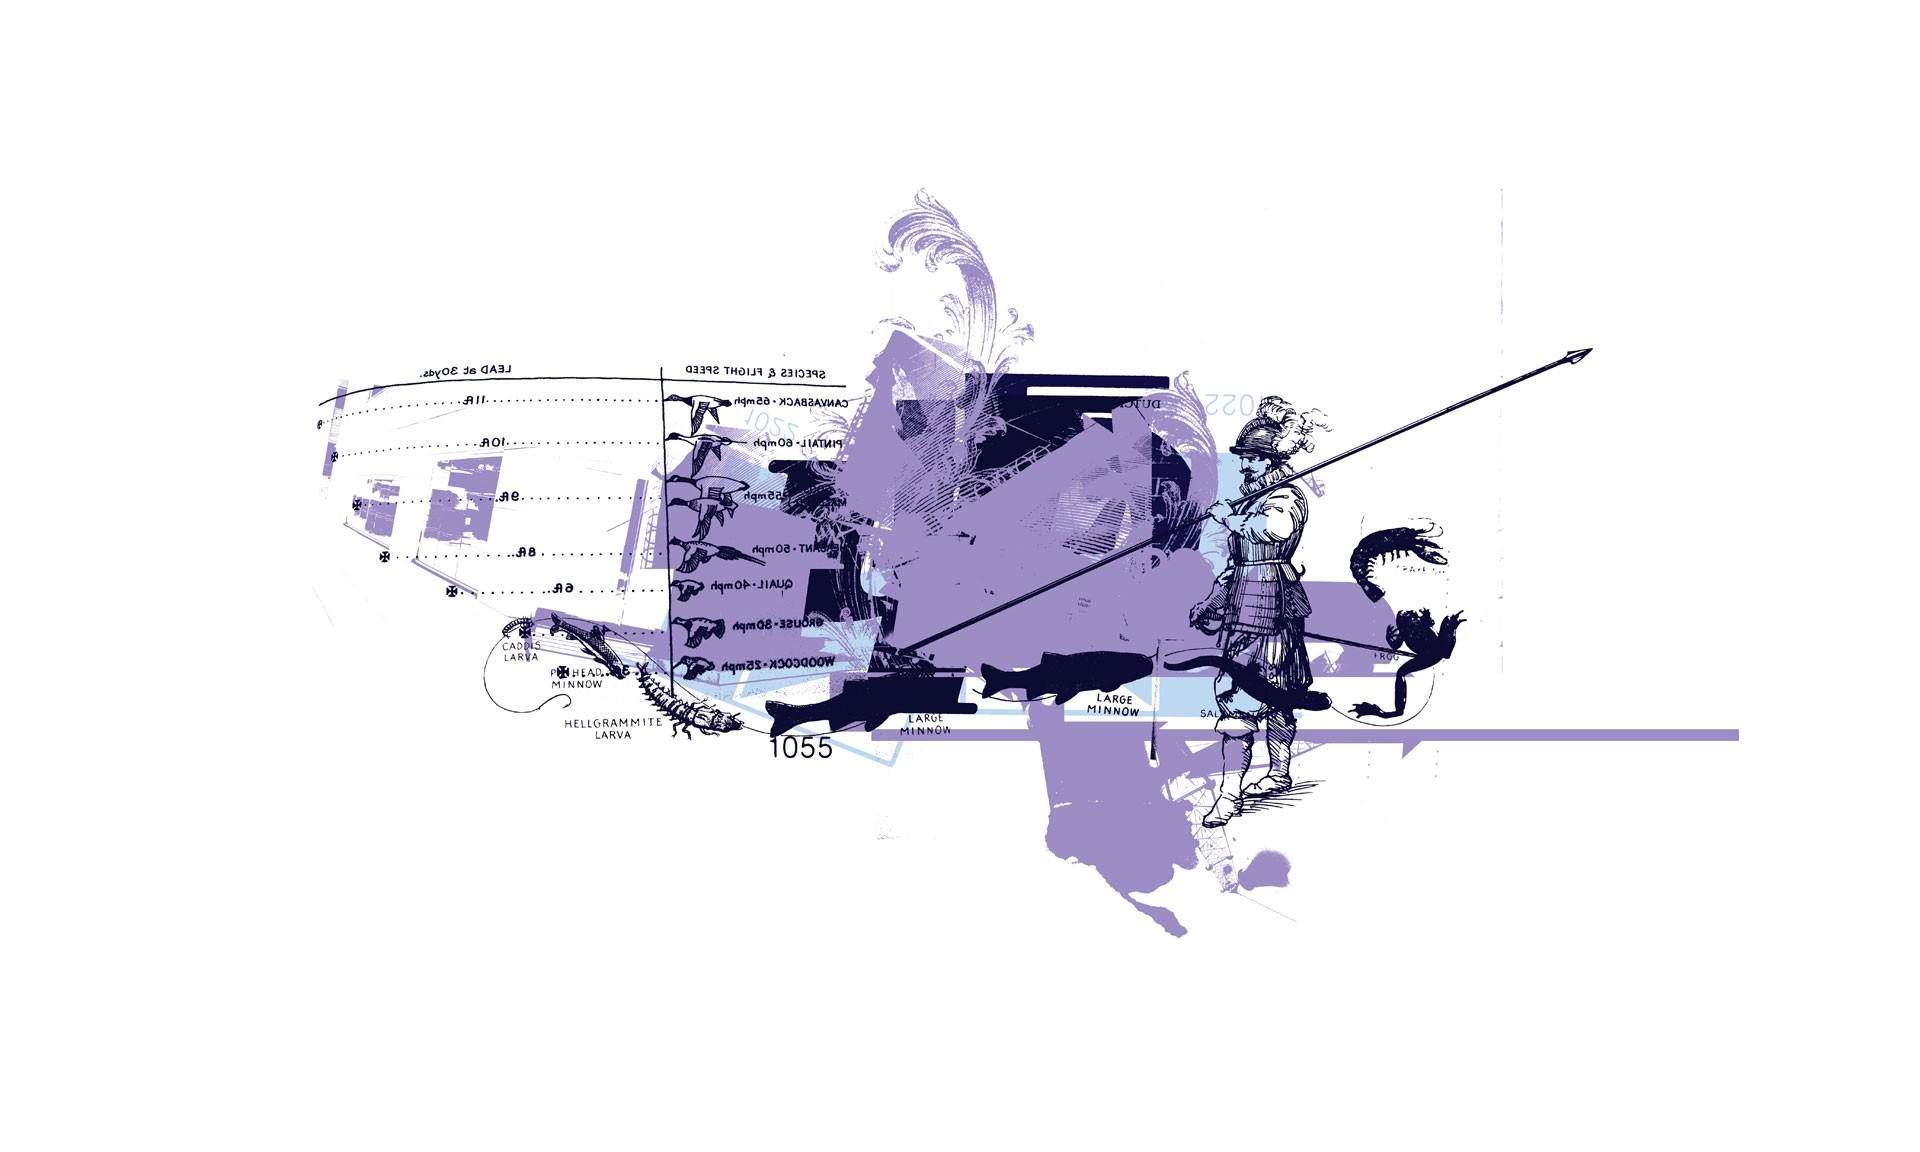 winslowsectionalmap4-fa